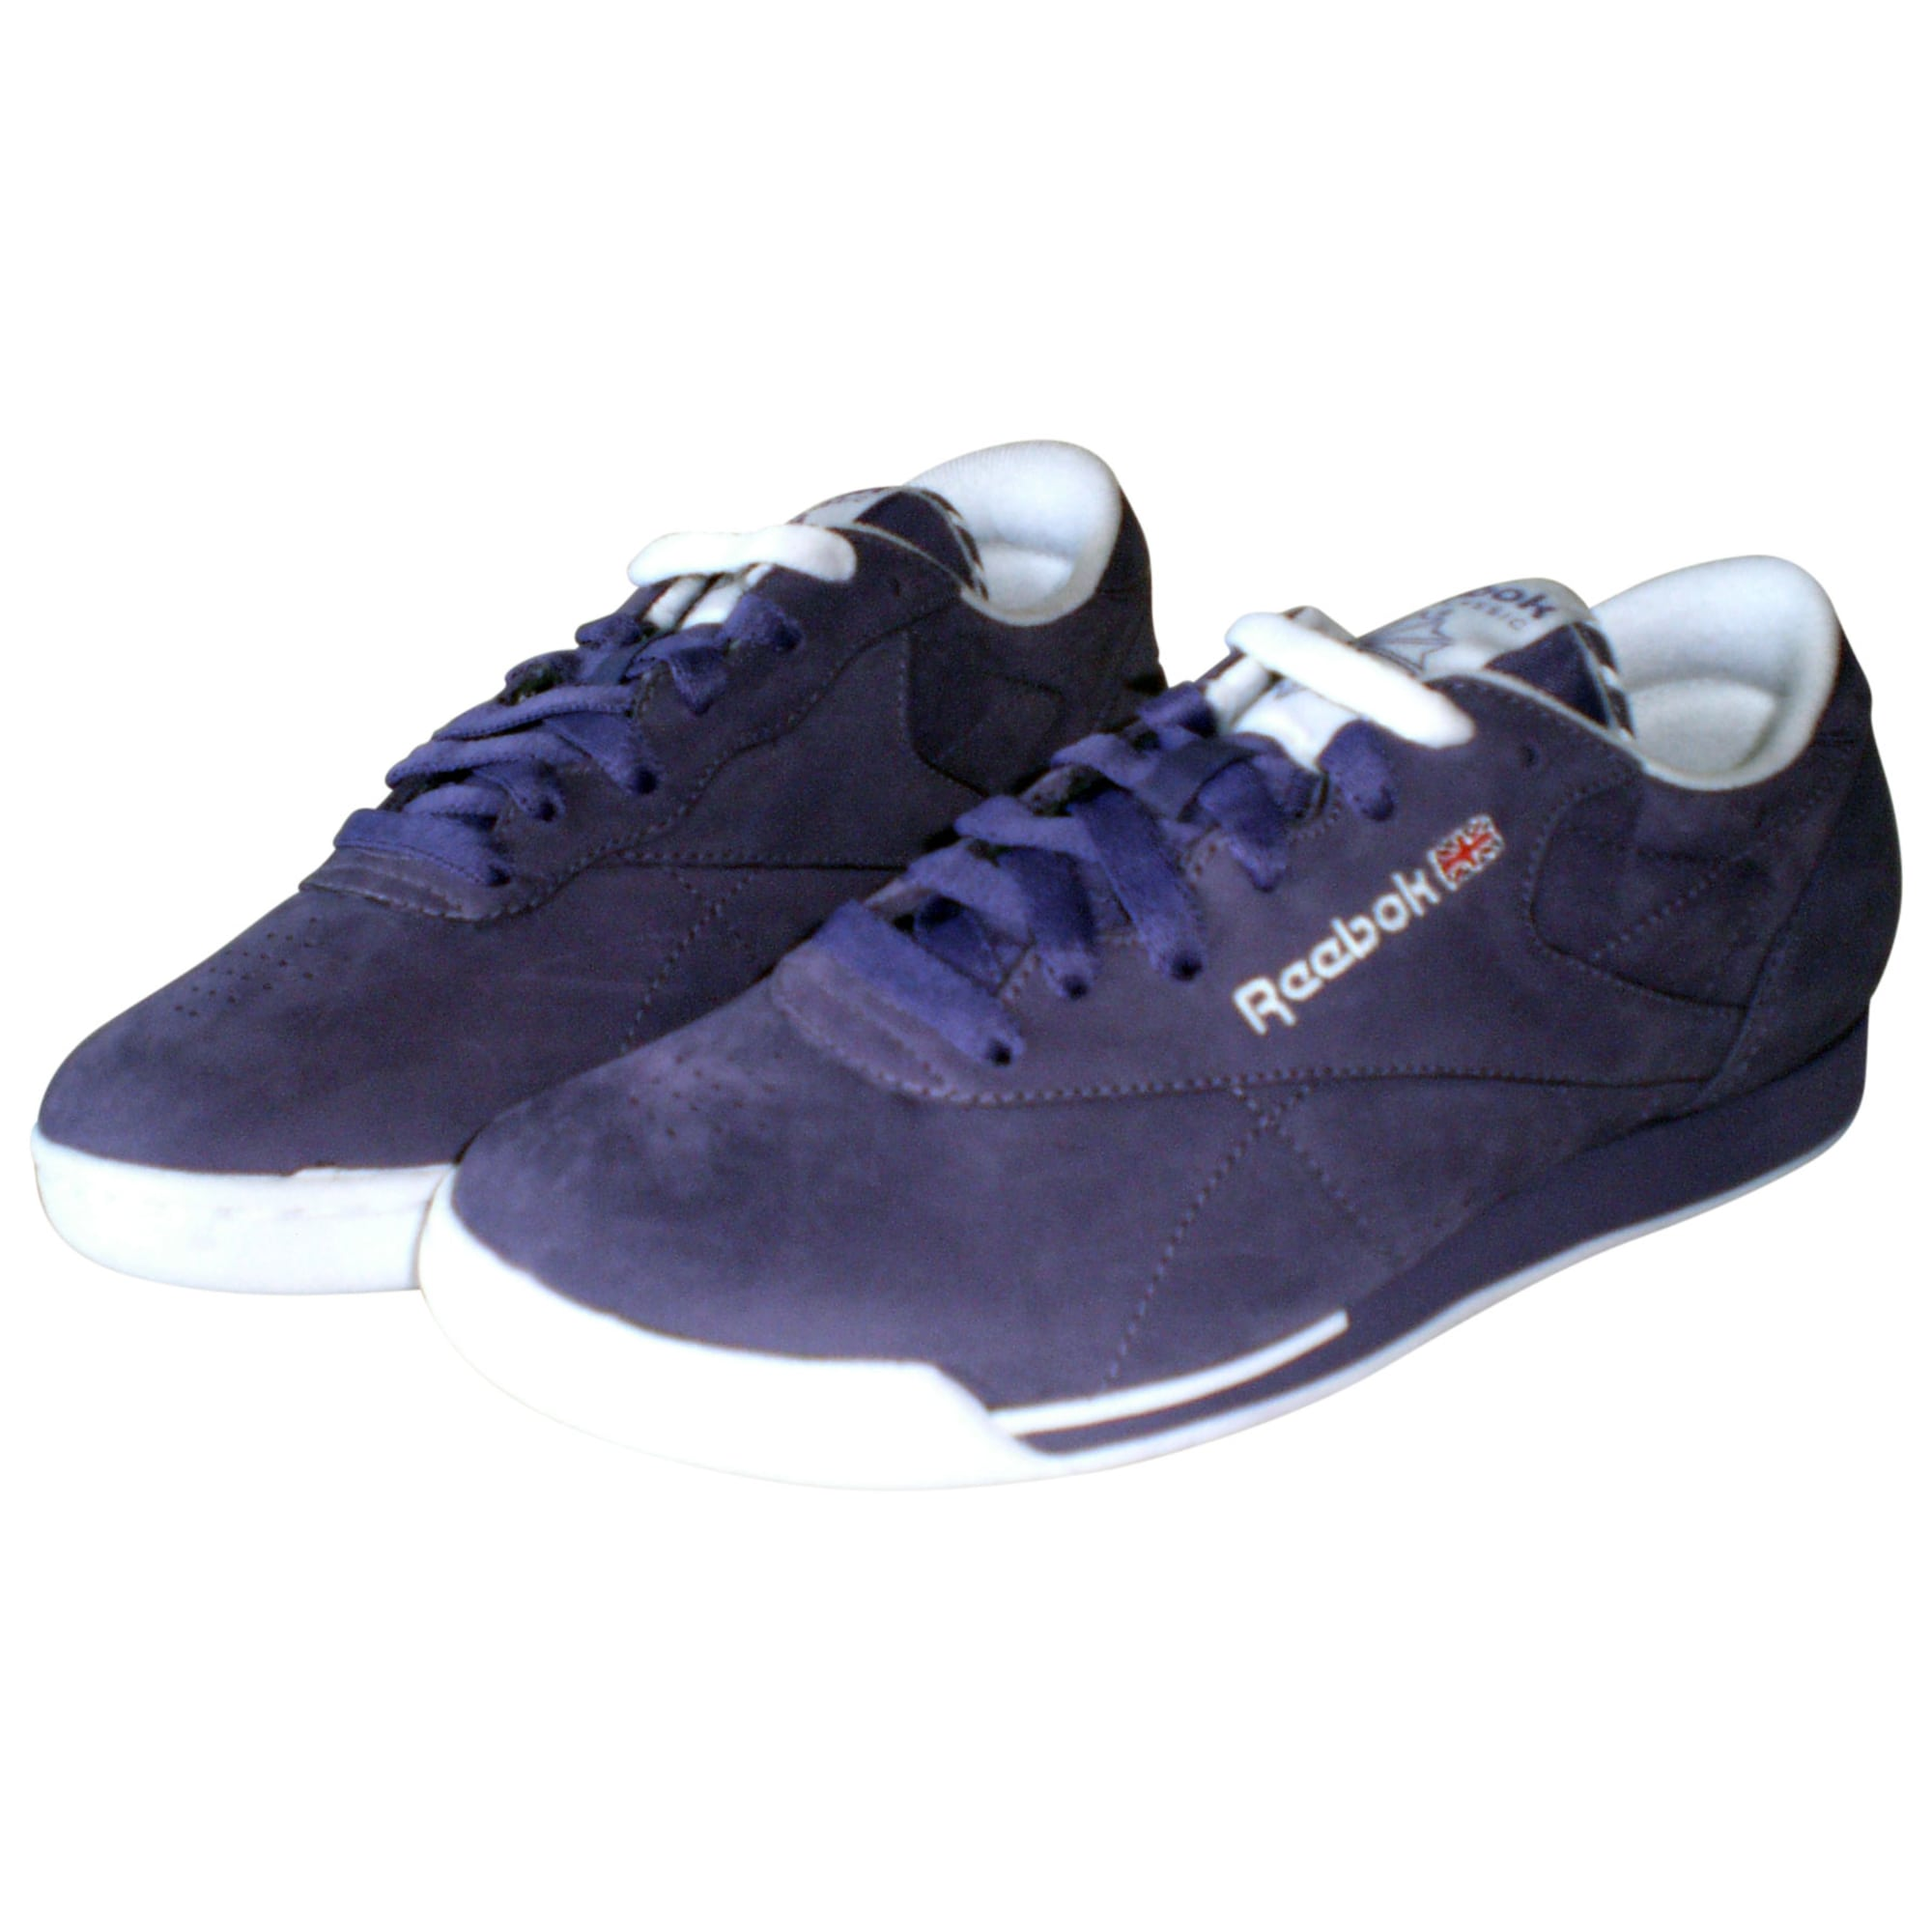 dd2e625d45d8c Baskets REEBOK 37 violet - 1558524